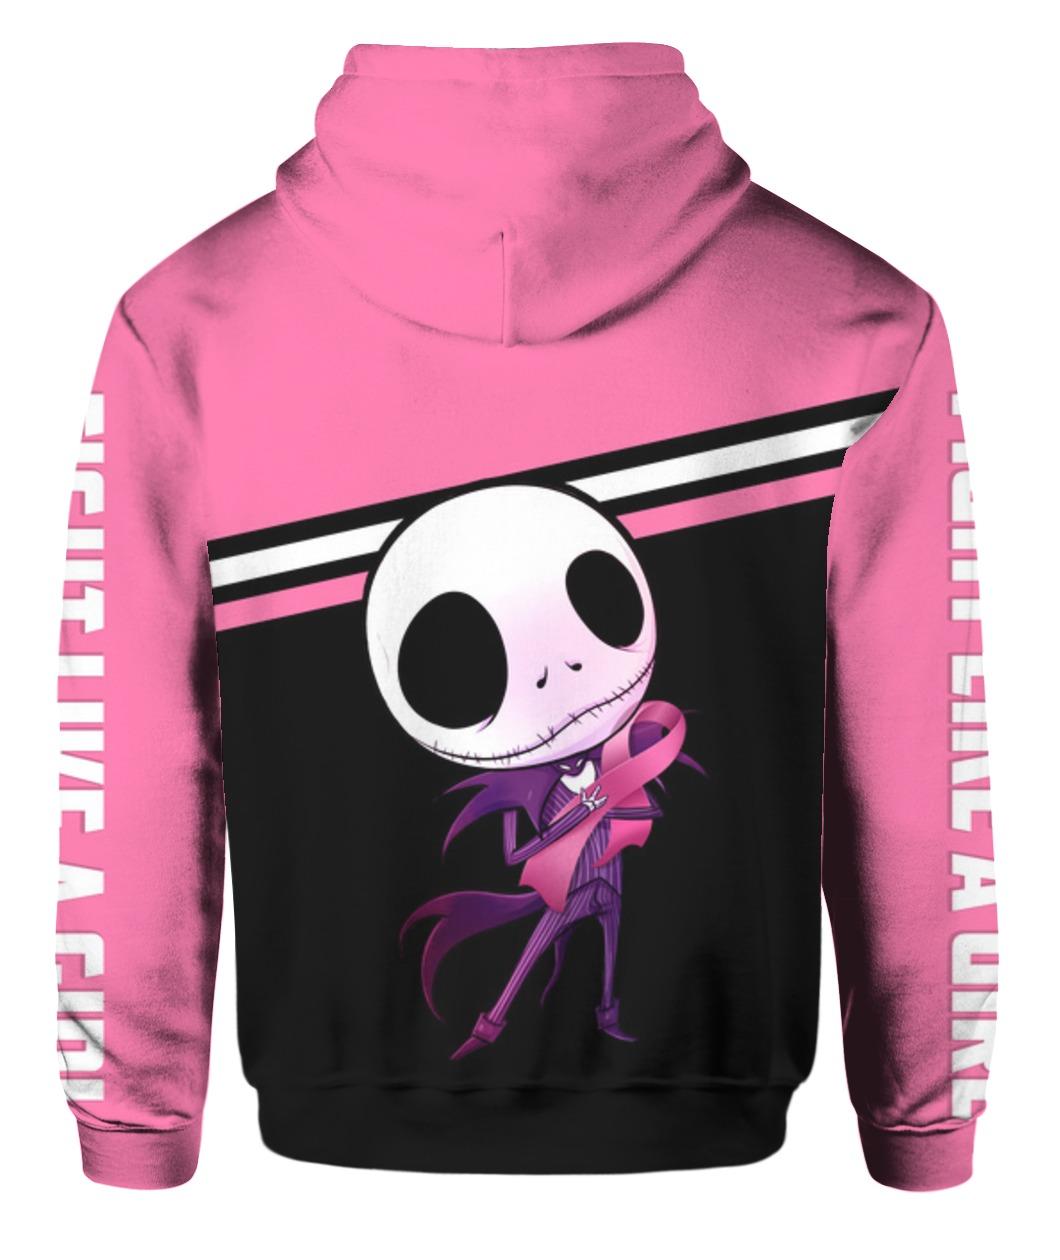 Baby jack skellington hugs ribbon breast cancer awareness all over printed hoodie - back